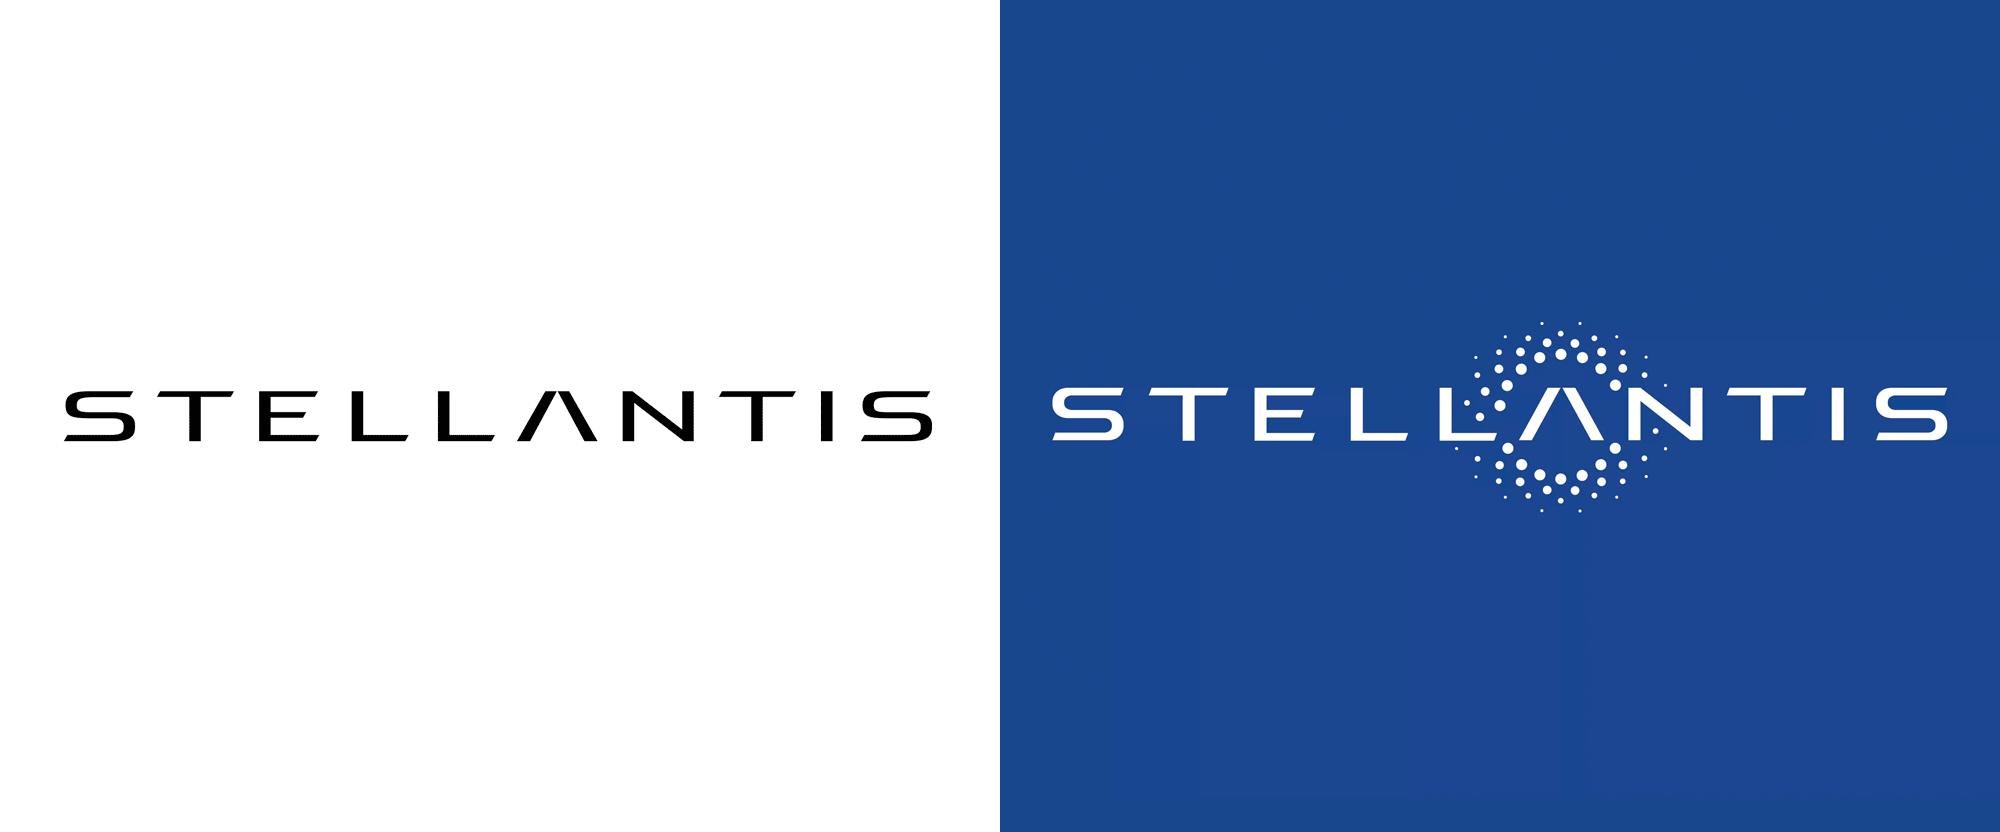 Stellantis Adds Dots